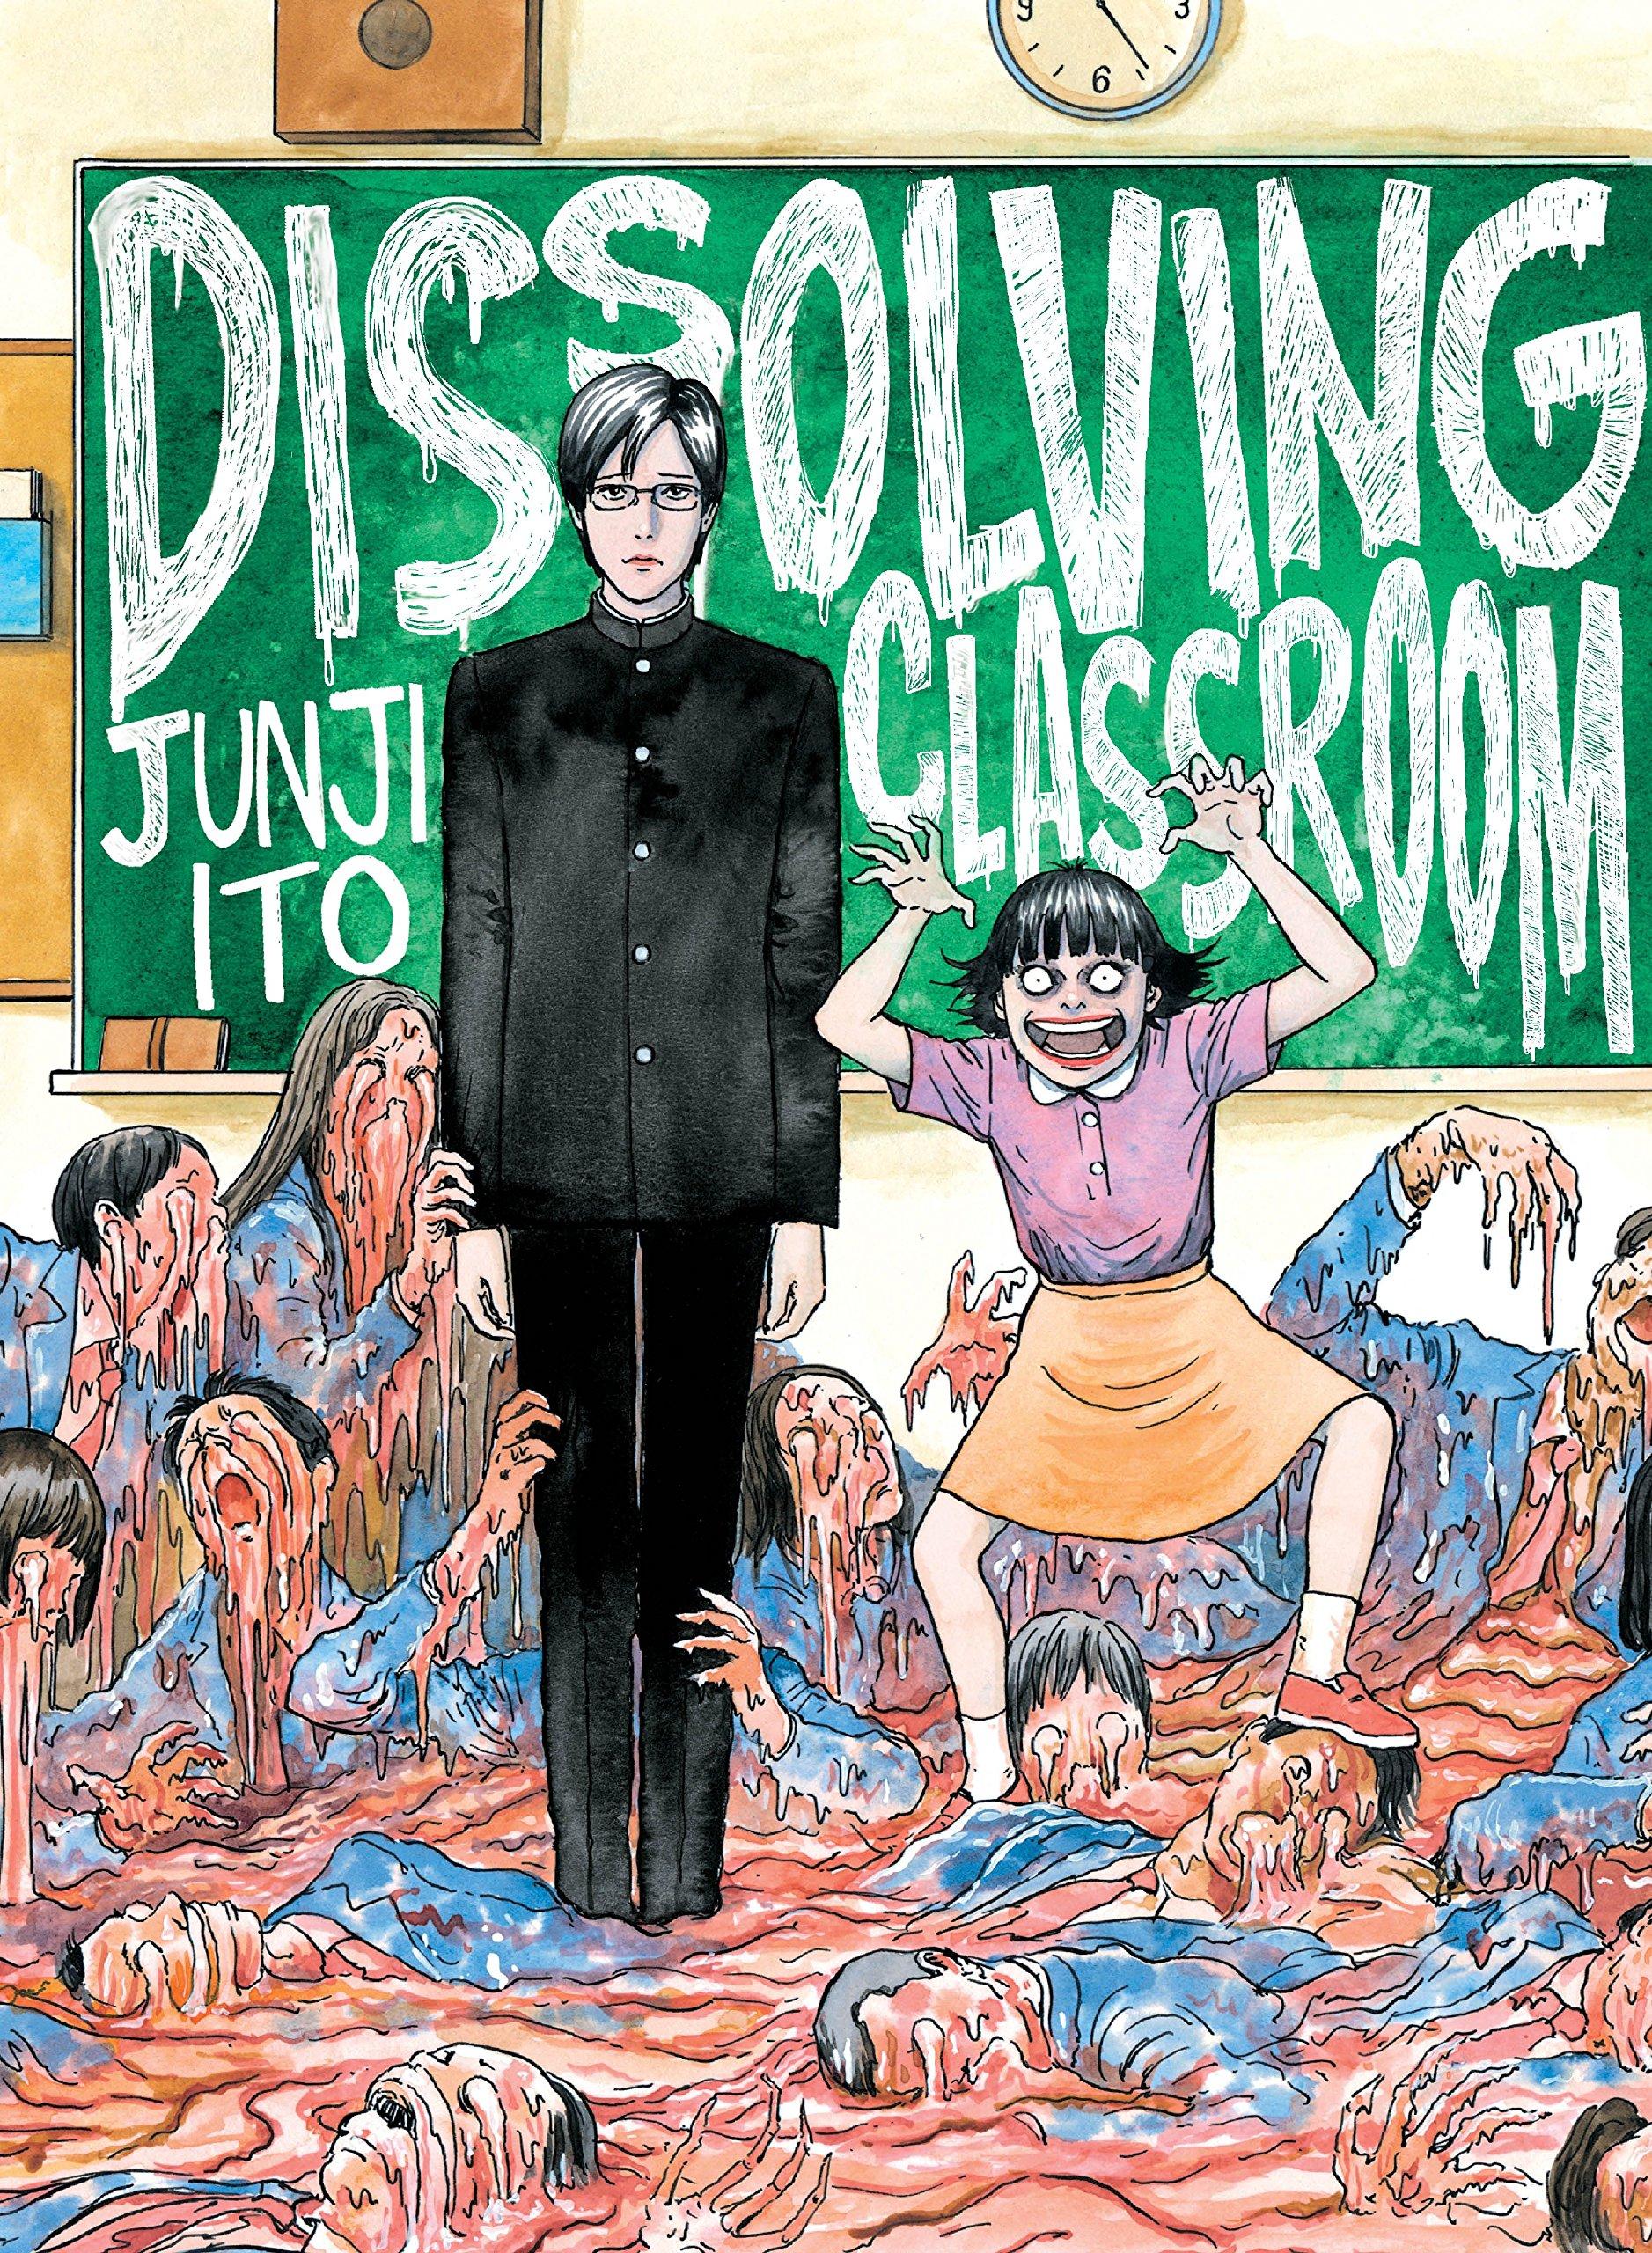 Amazon.com: Dissolving Classroom (9781942993858): Ito, Junji: Books